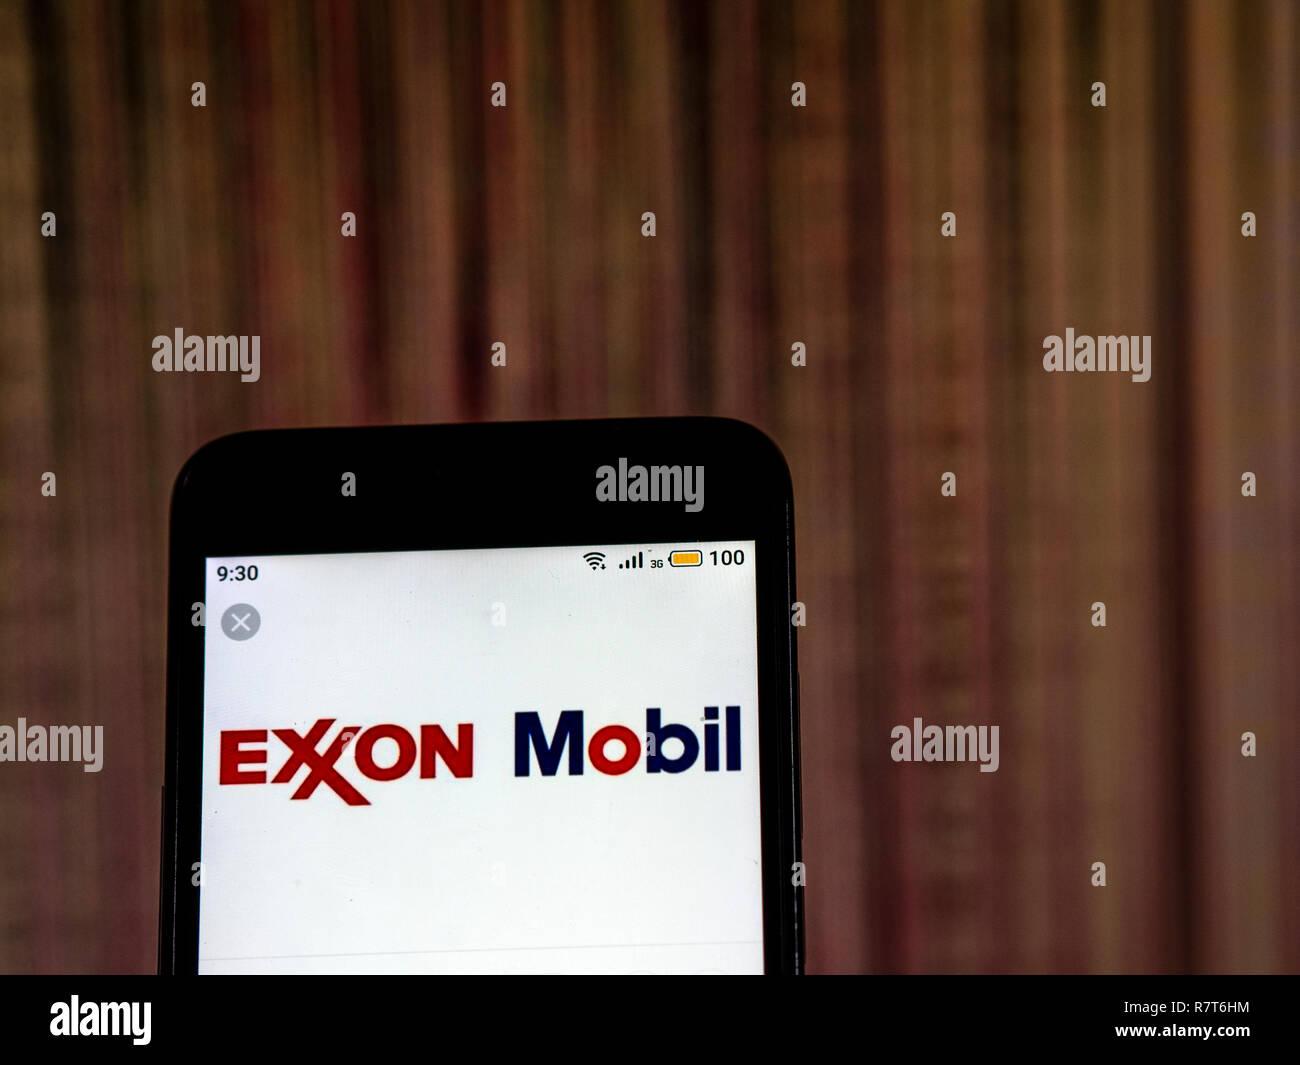 ExxonMobil logo seen displayed on smart phone Stock Photo